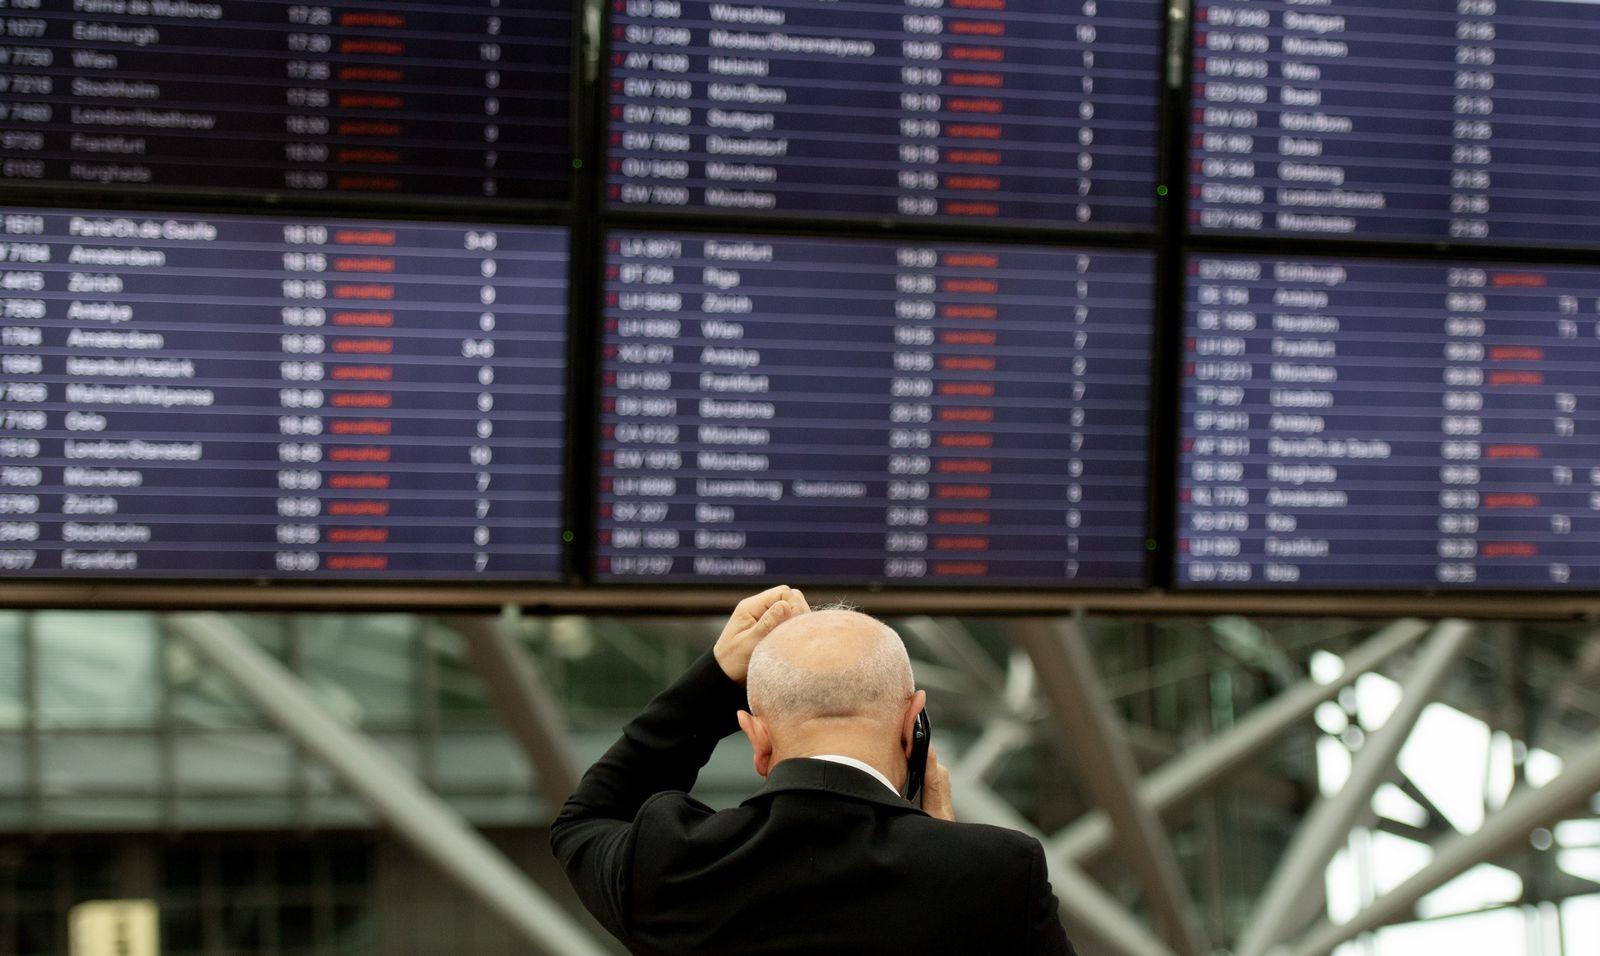 Stromausfall am Flughafen Hamburg